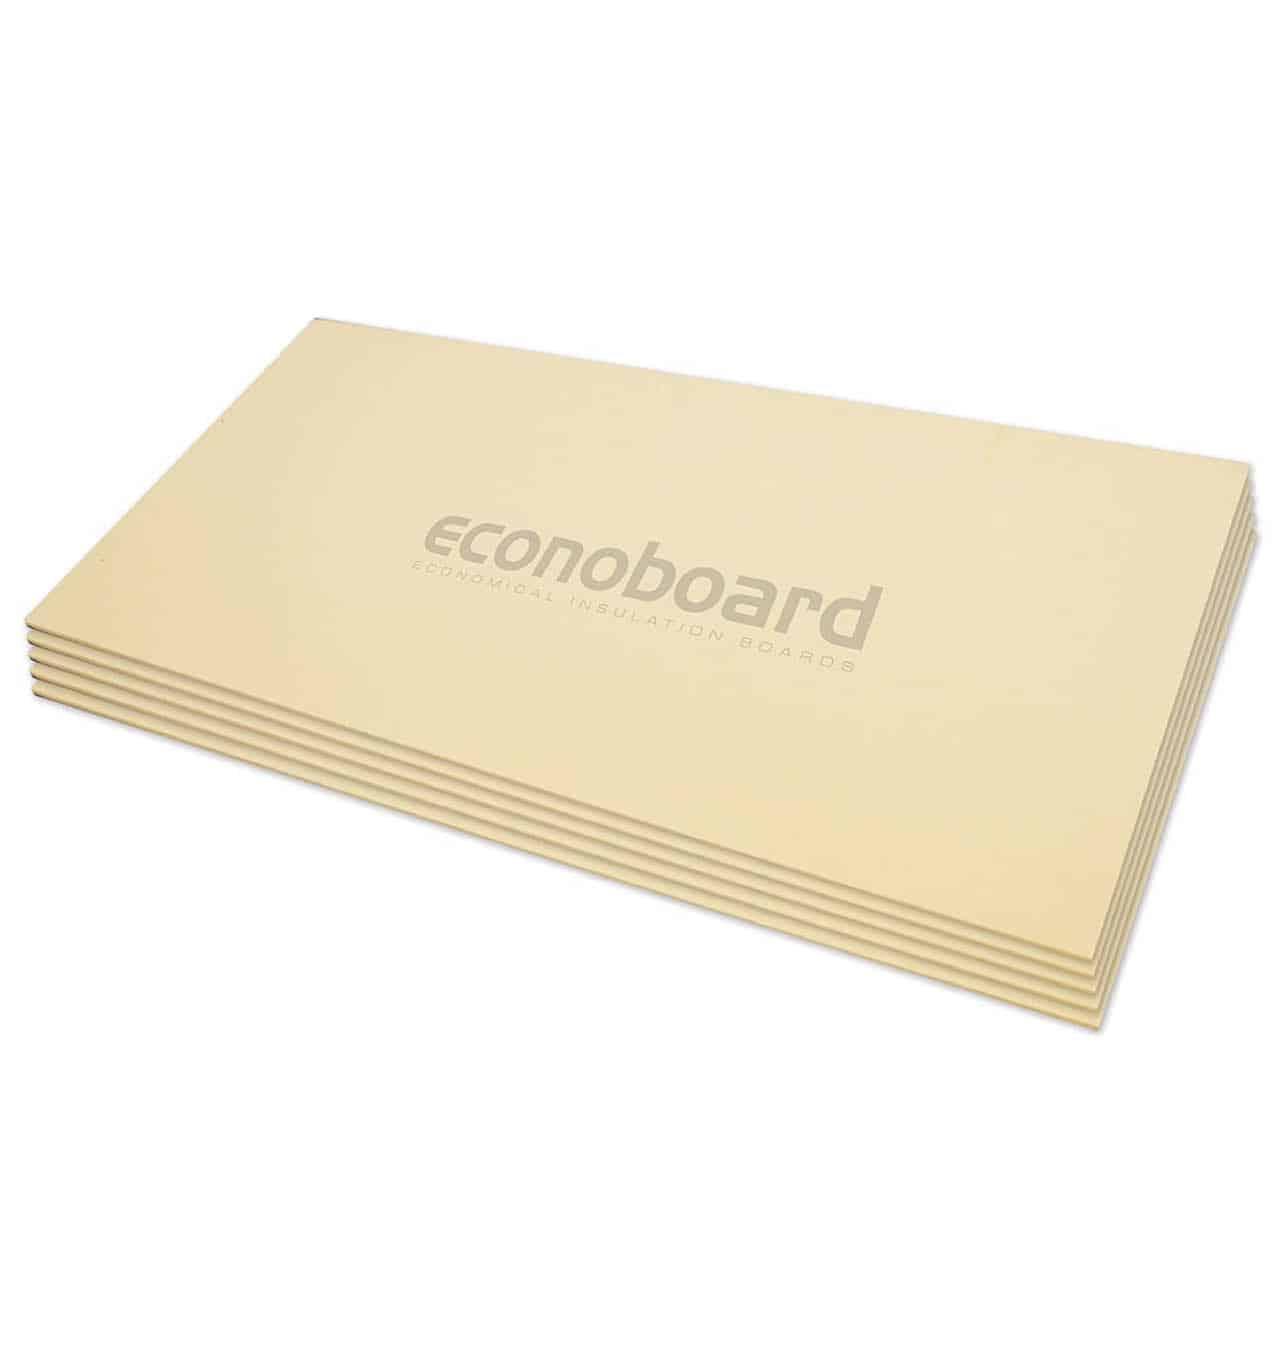 econoboard-uncoated